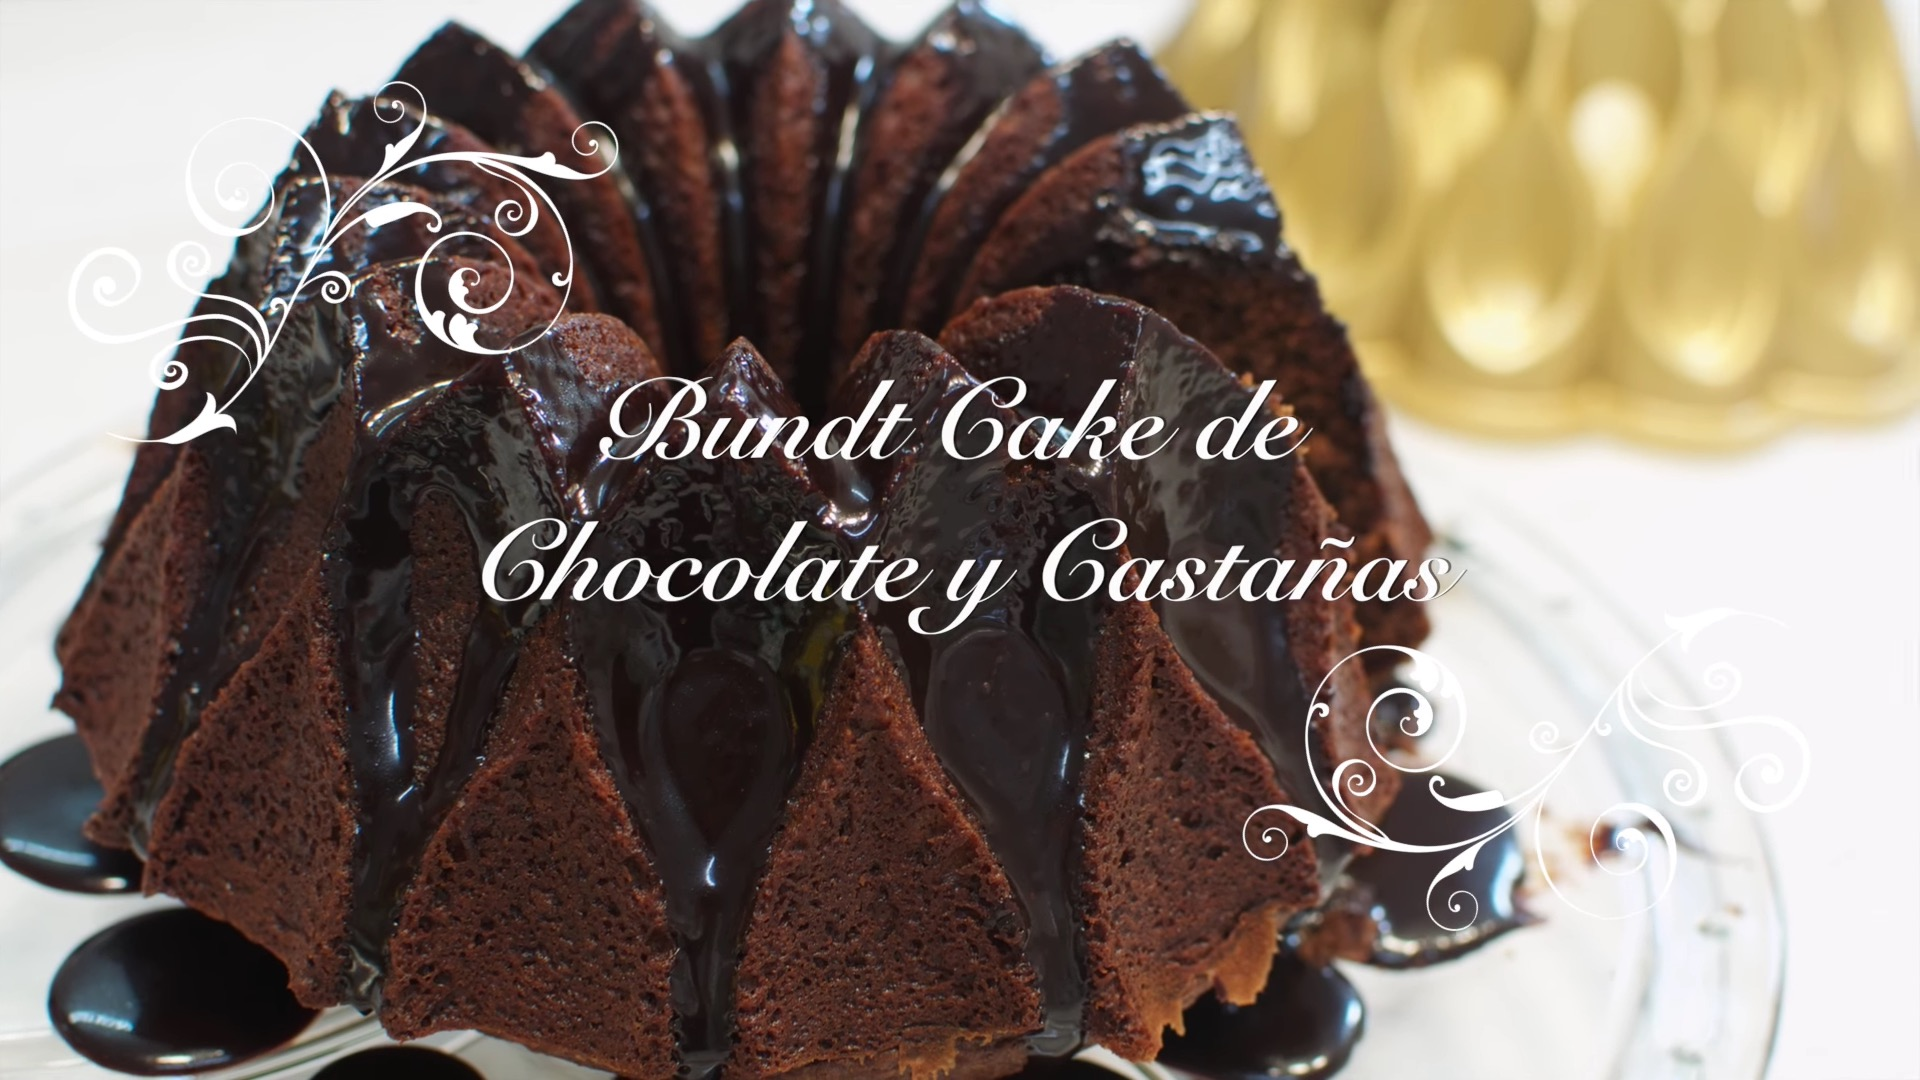 Receta de Bundt Cake de Chocolate